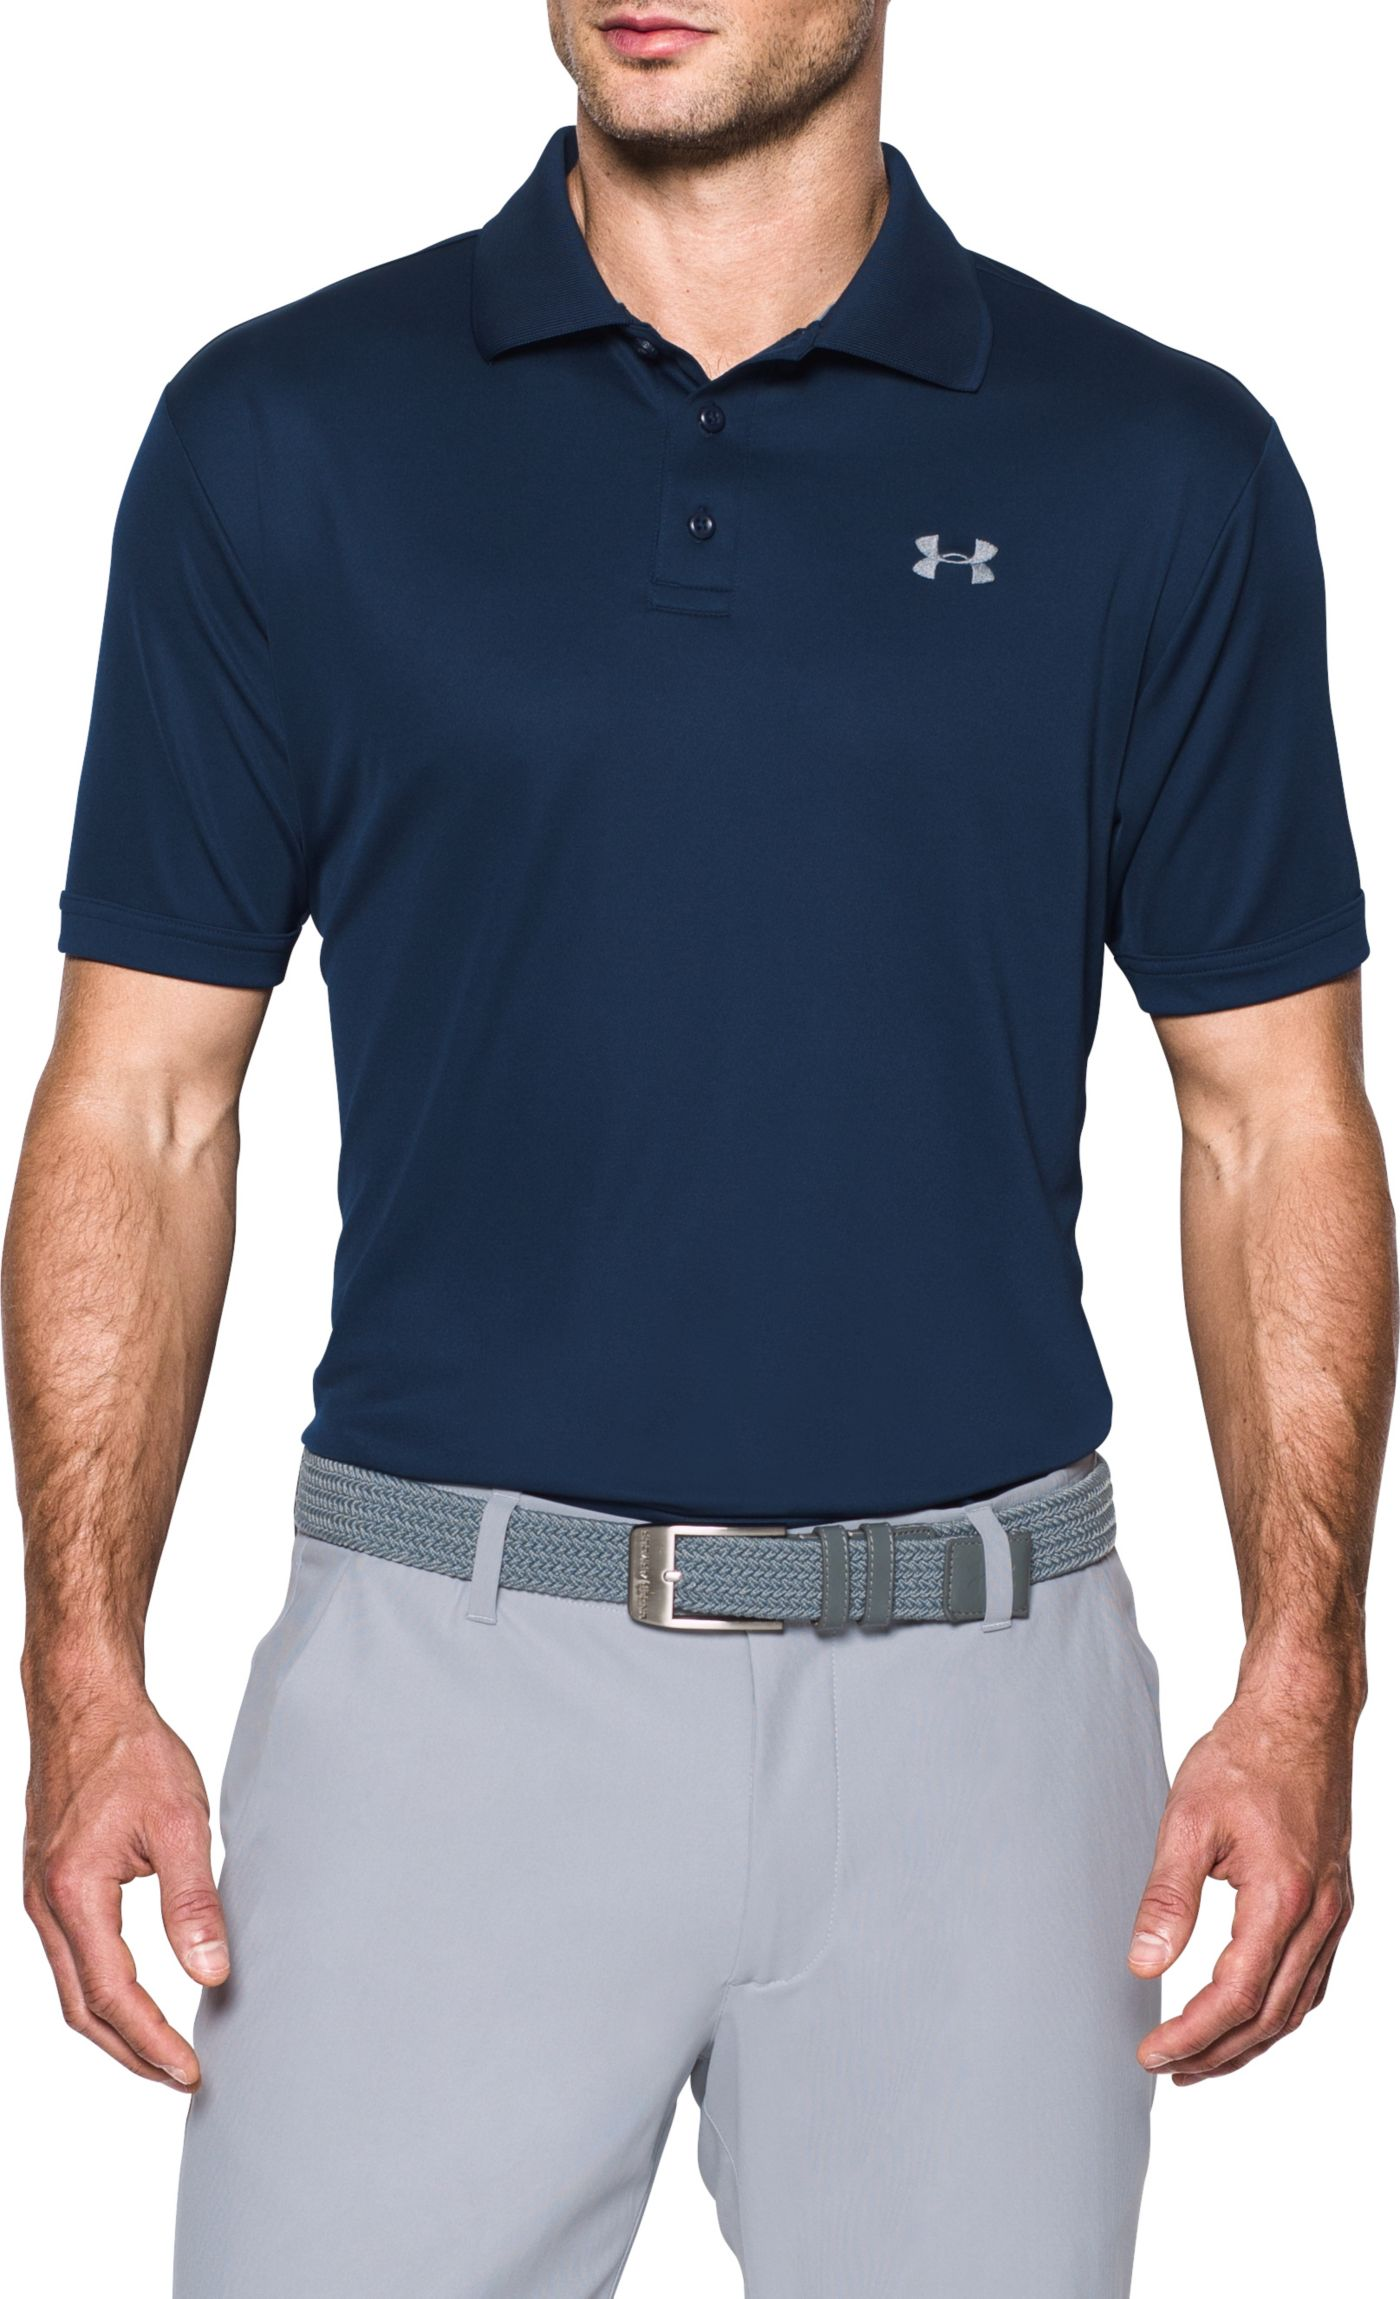 Under Armour Men's Performance Golf Polo